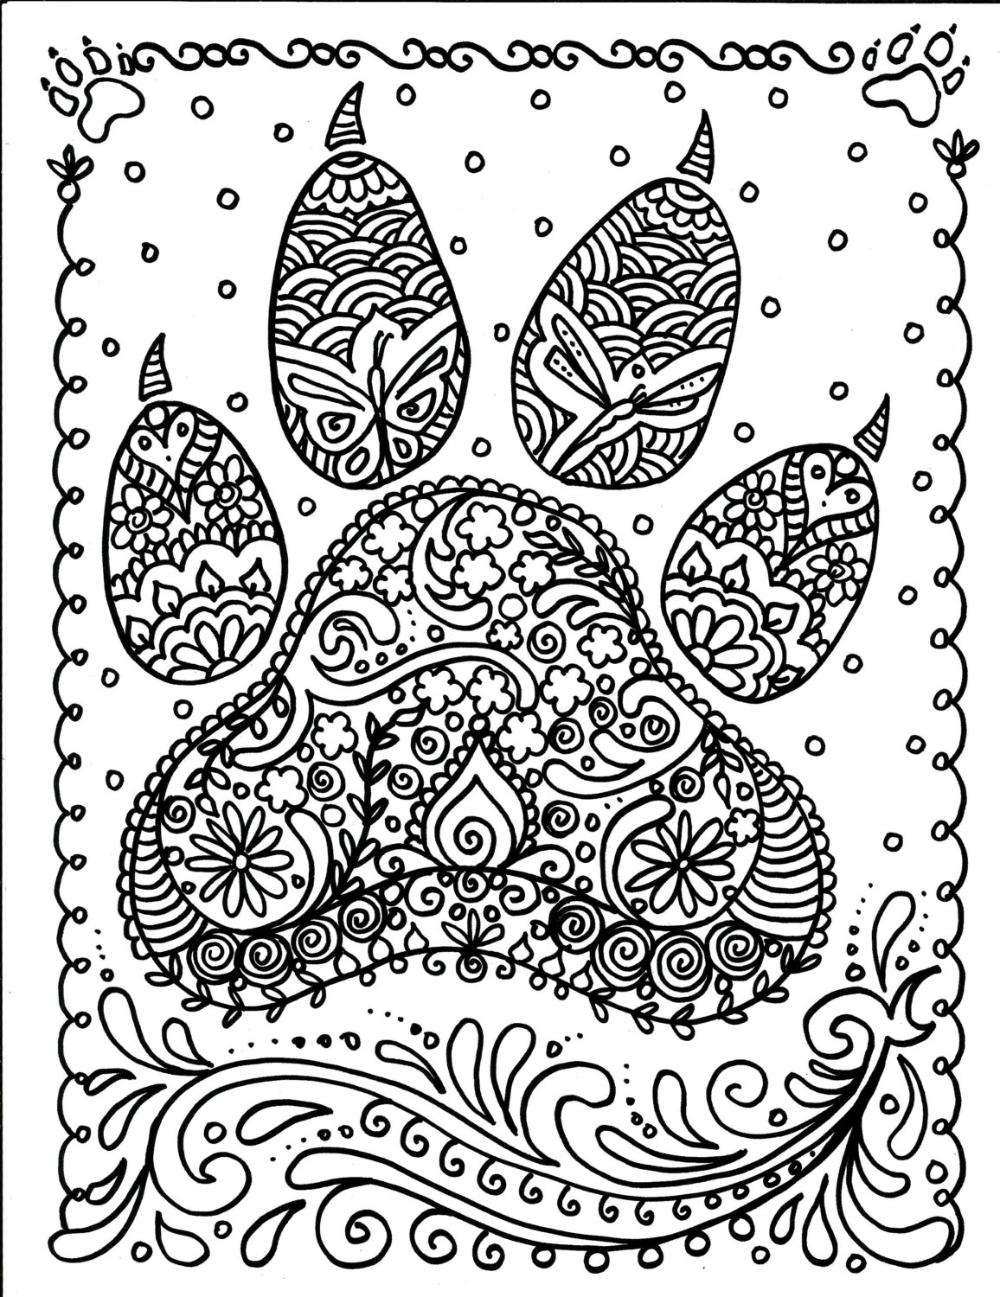 Pin On Coloring Pages Deborah Muller [ 1297 x 1000 Pixel ]